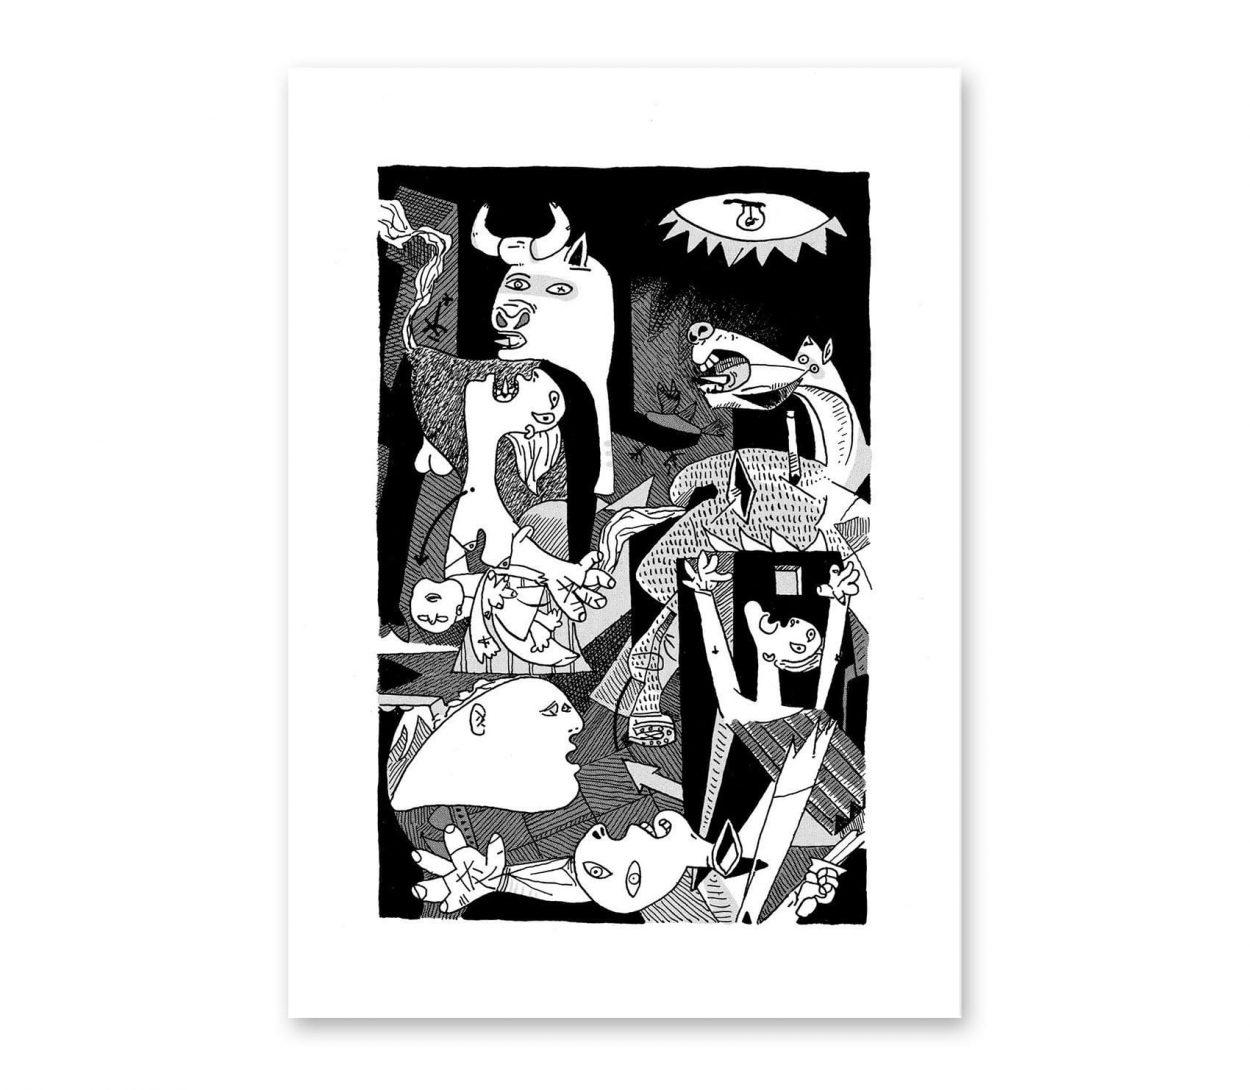 Lámina impresión digital Guernica de Pablo Picasso. Arte cubista, abstracto. Ilustración poster